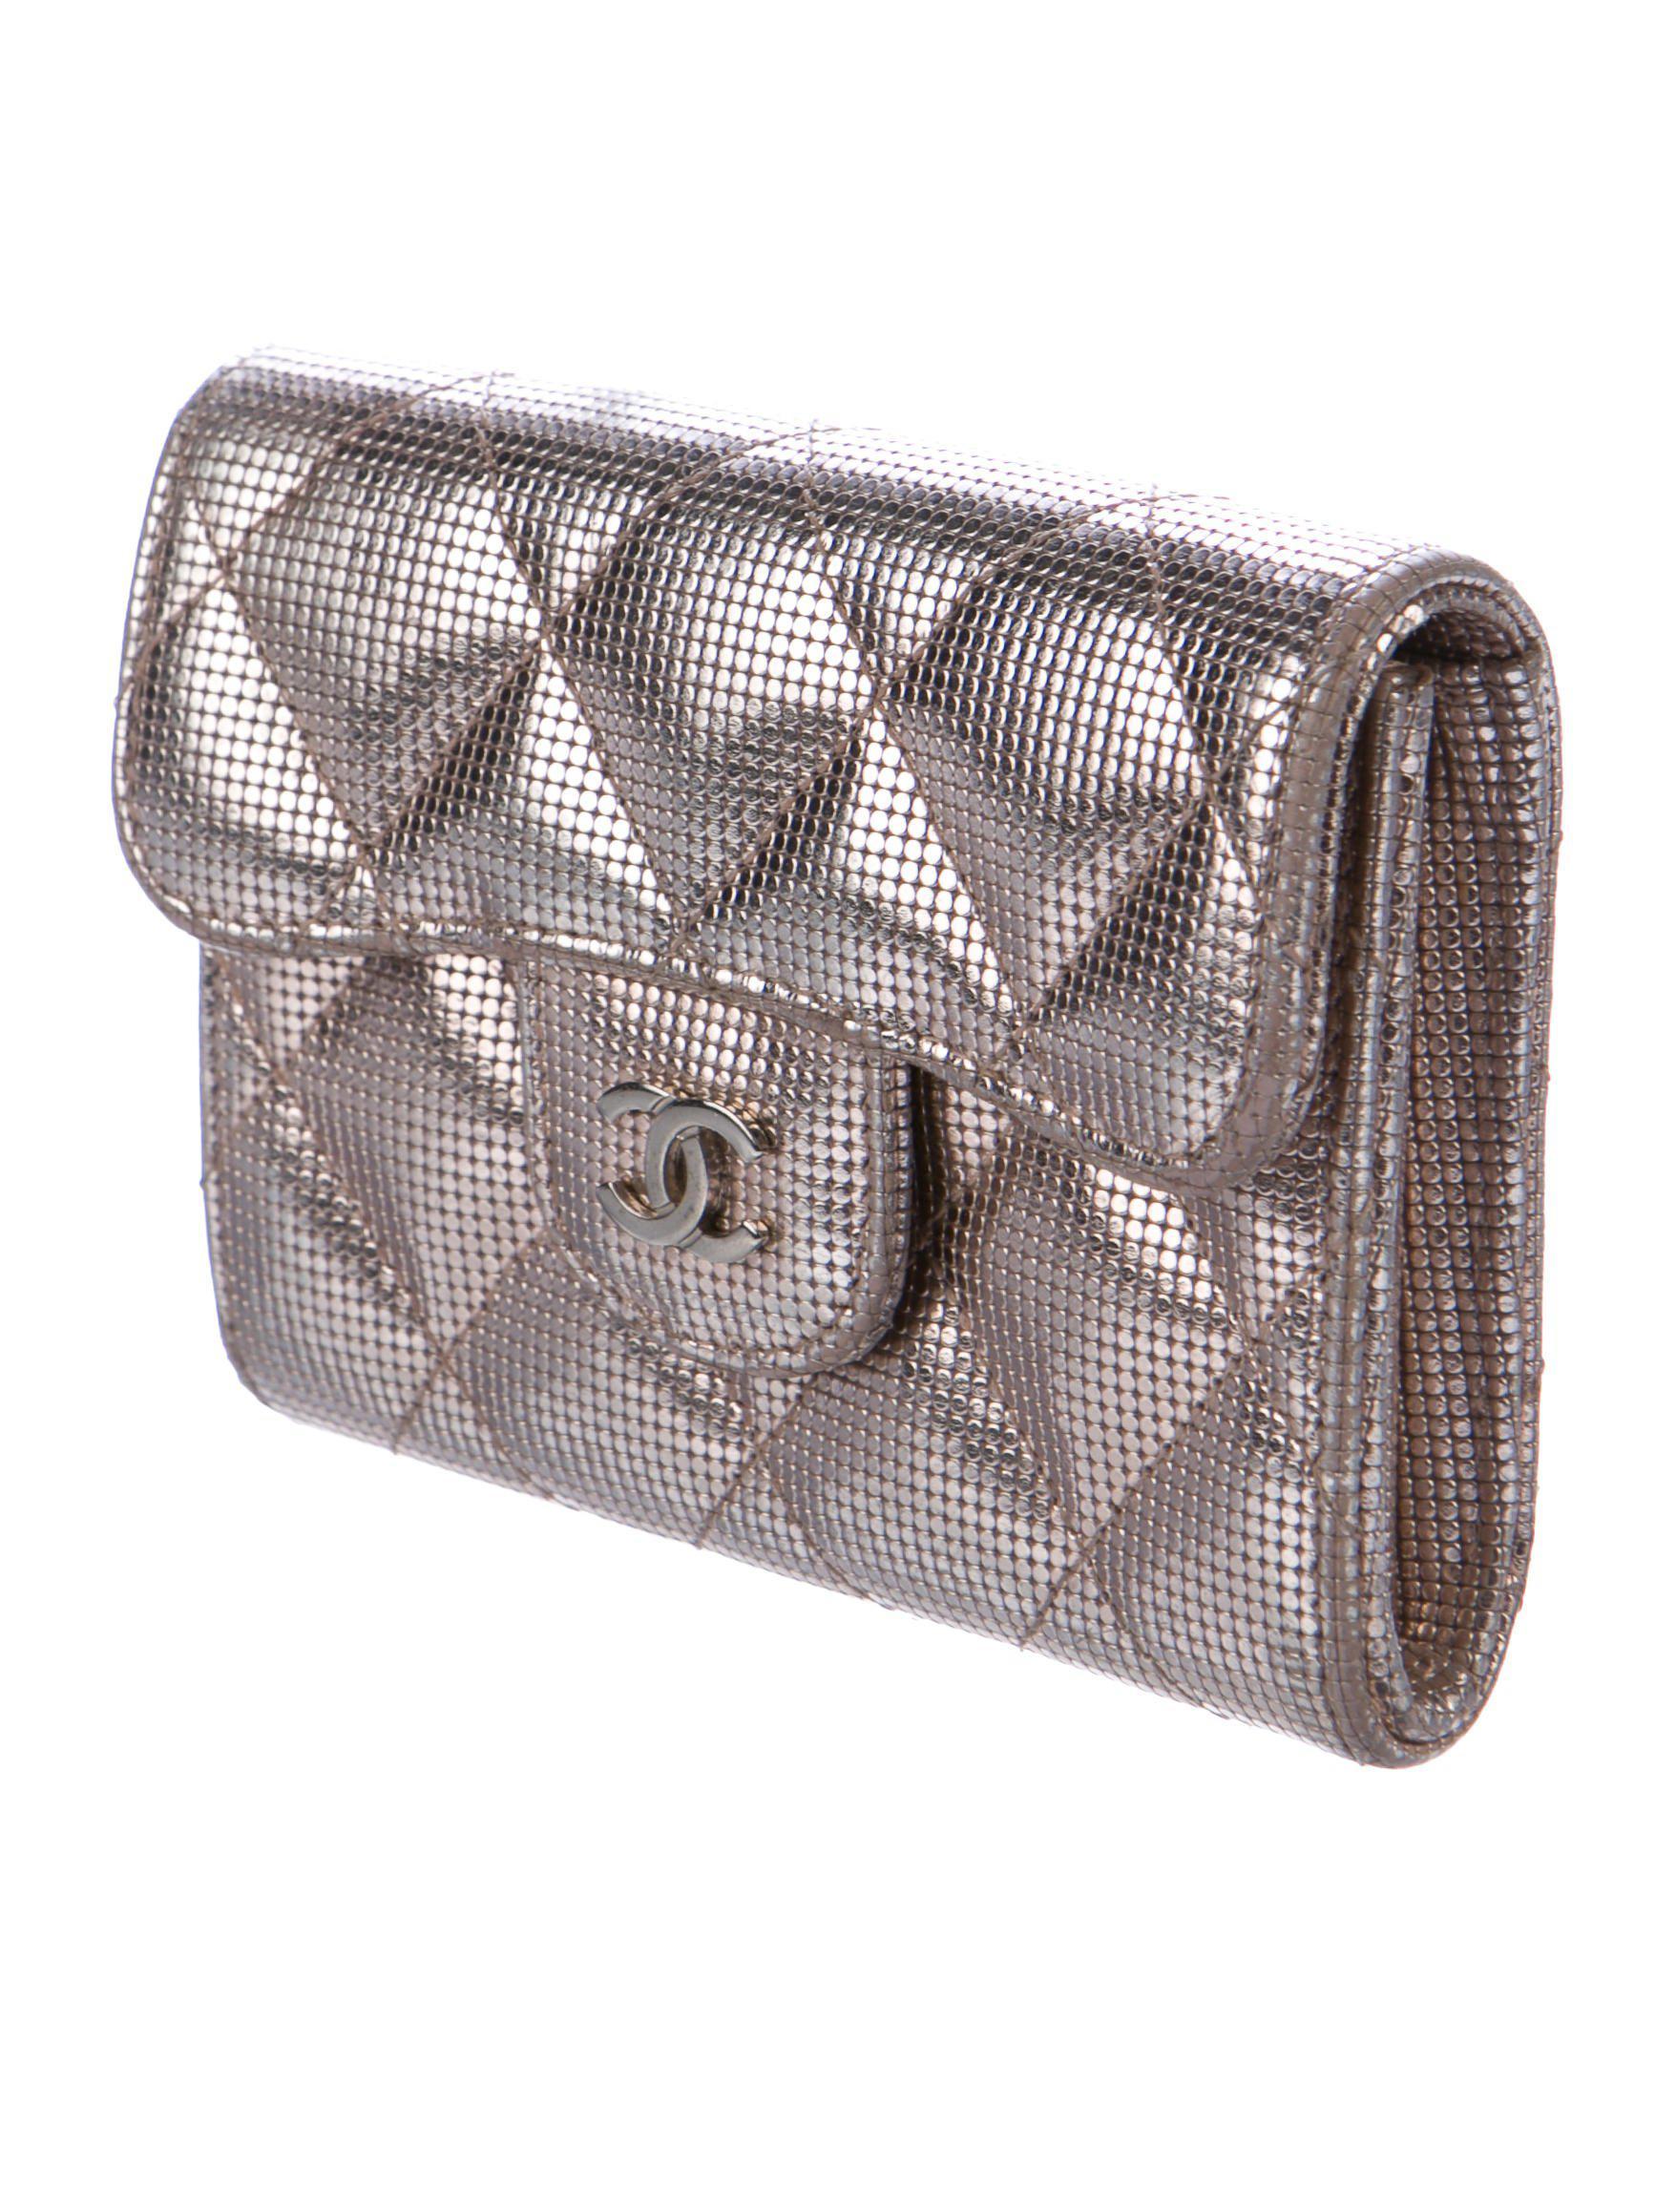 Lyst - Chanel Business Cardholder in Metallic